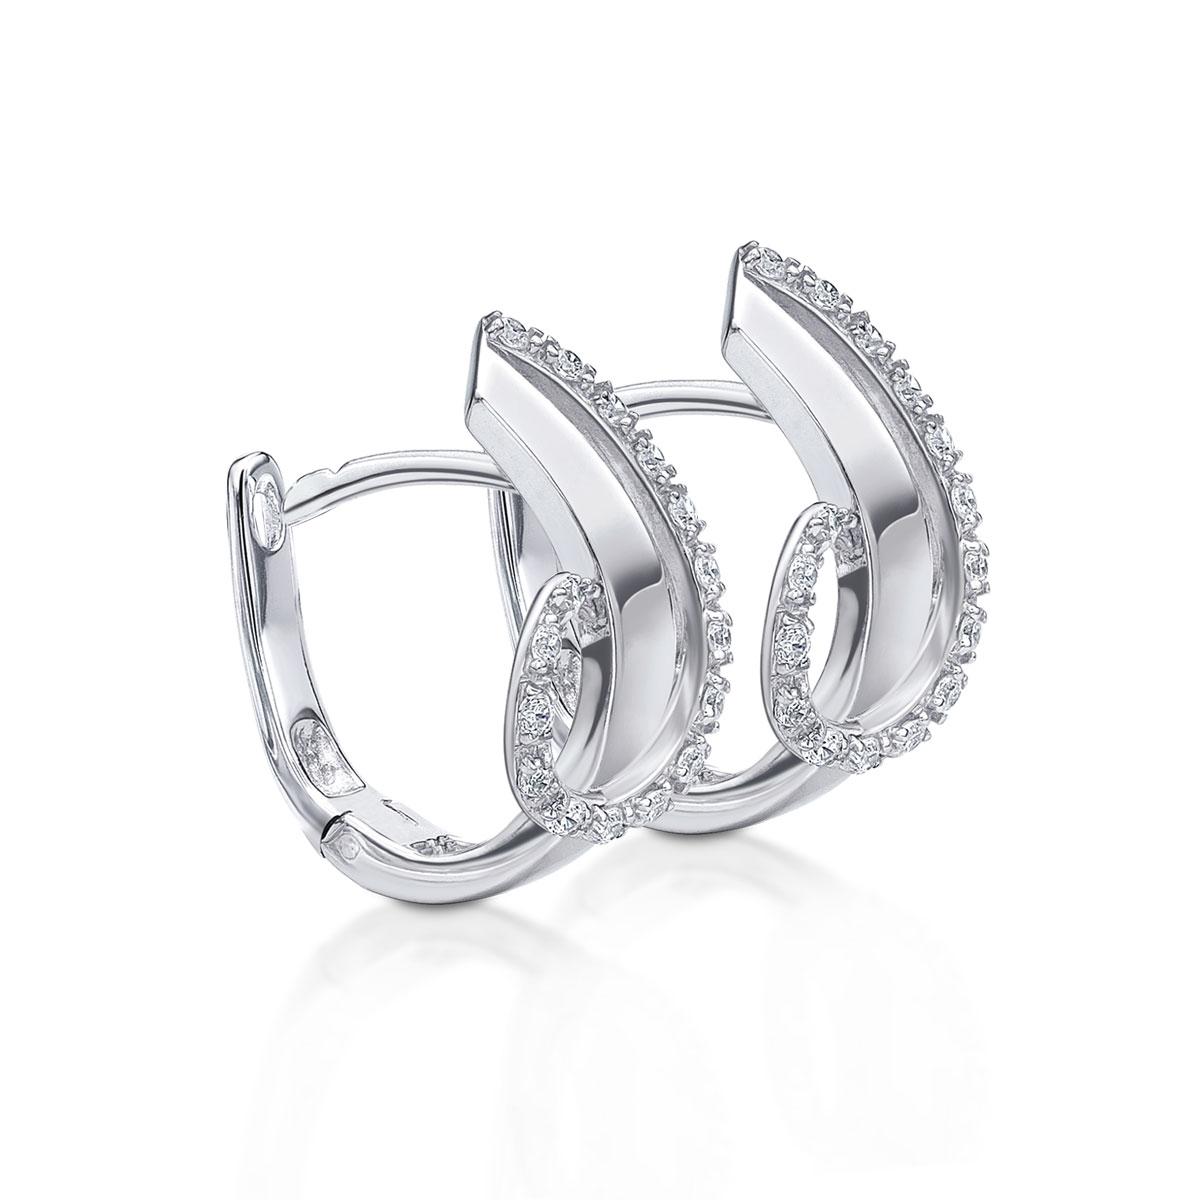 ED147 璀璨軌跡-氣質曲貝奢華耳環/一對販售